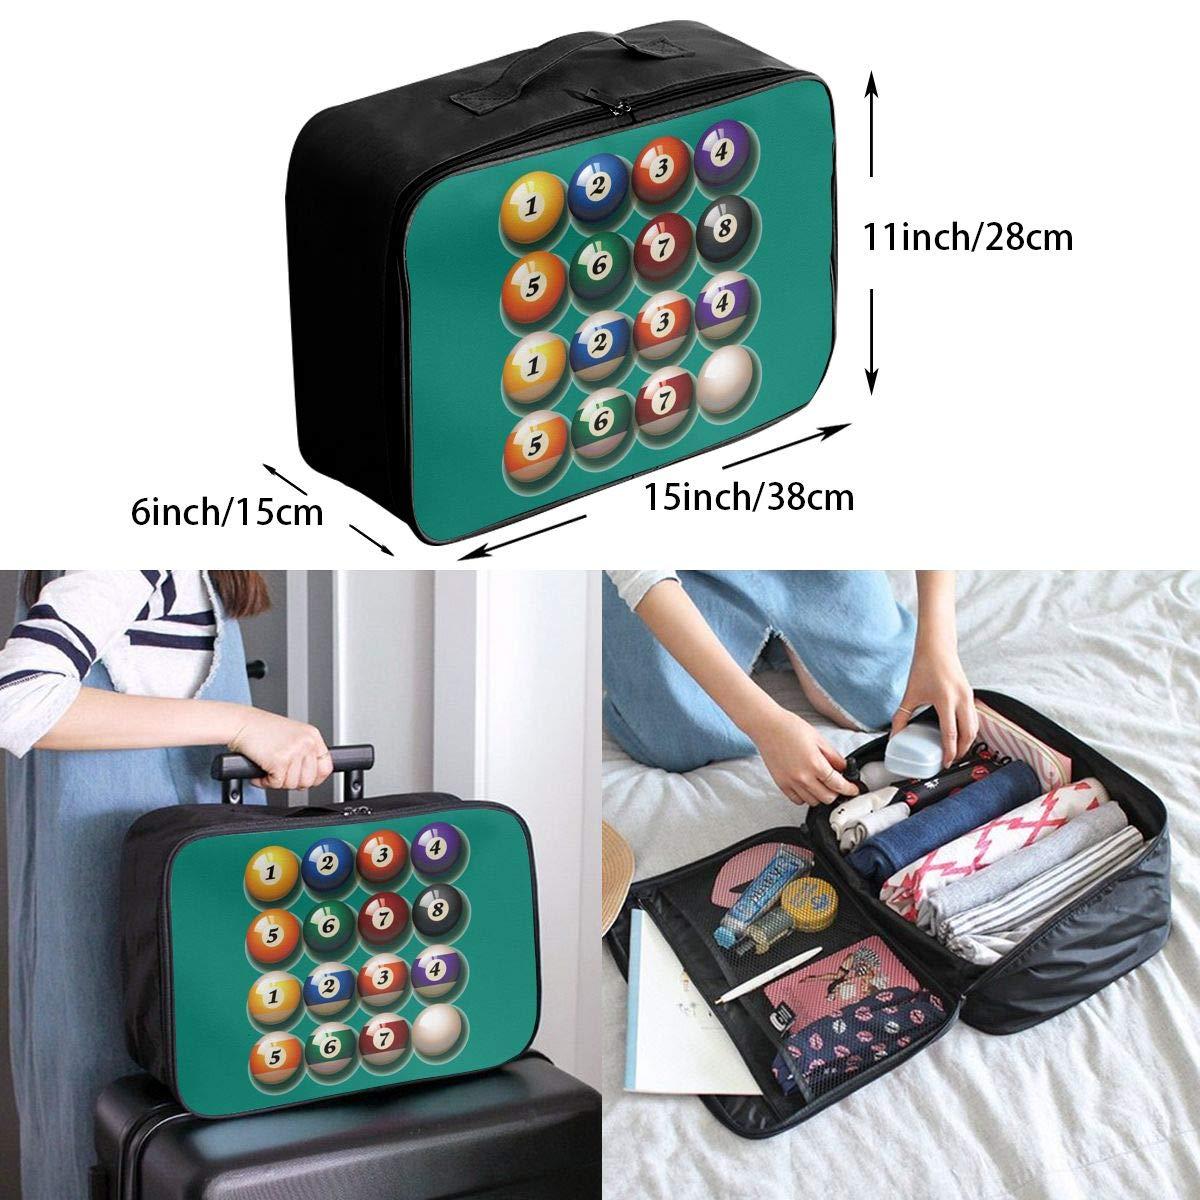 Travel Luggage Duffle Bag Lightweight Portable Handbag Billiards Large Capacity Waterproof Foldable Storage Tote